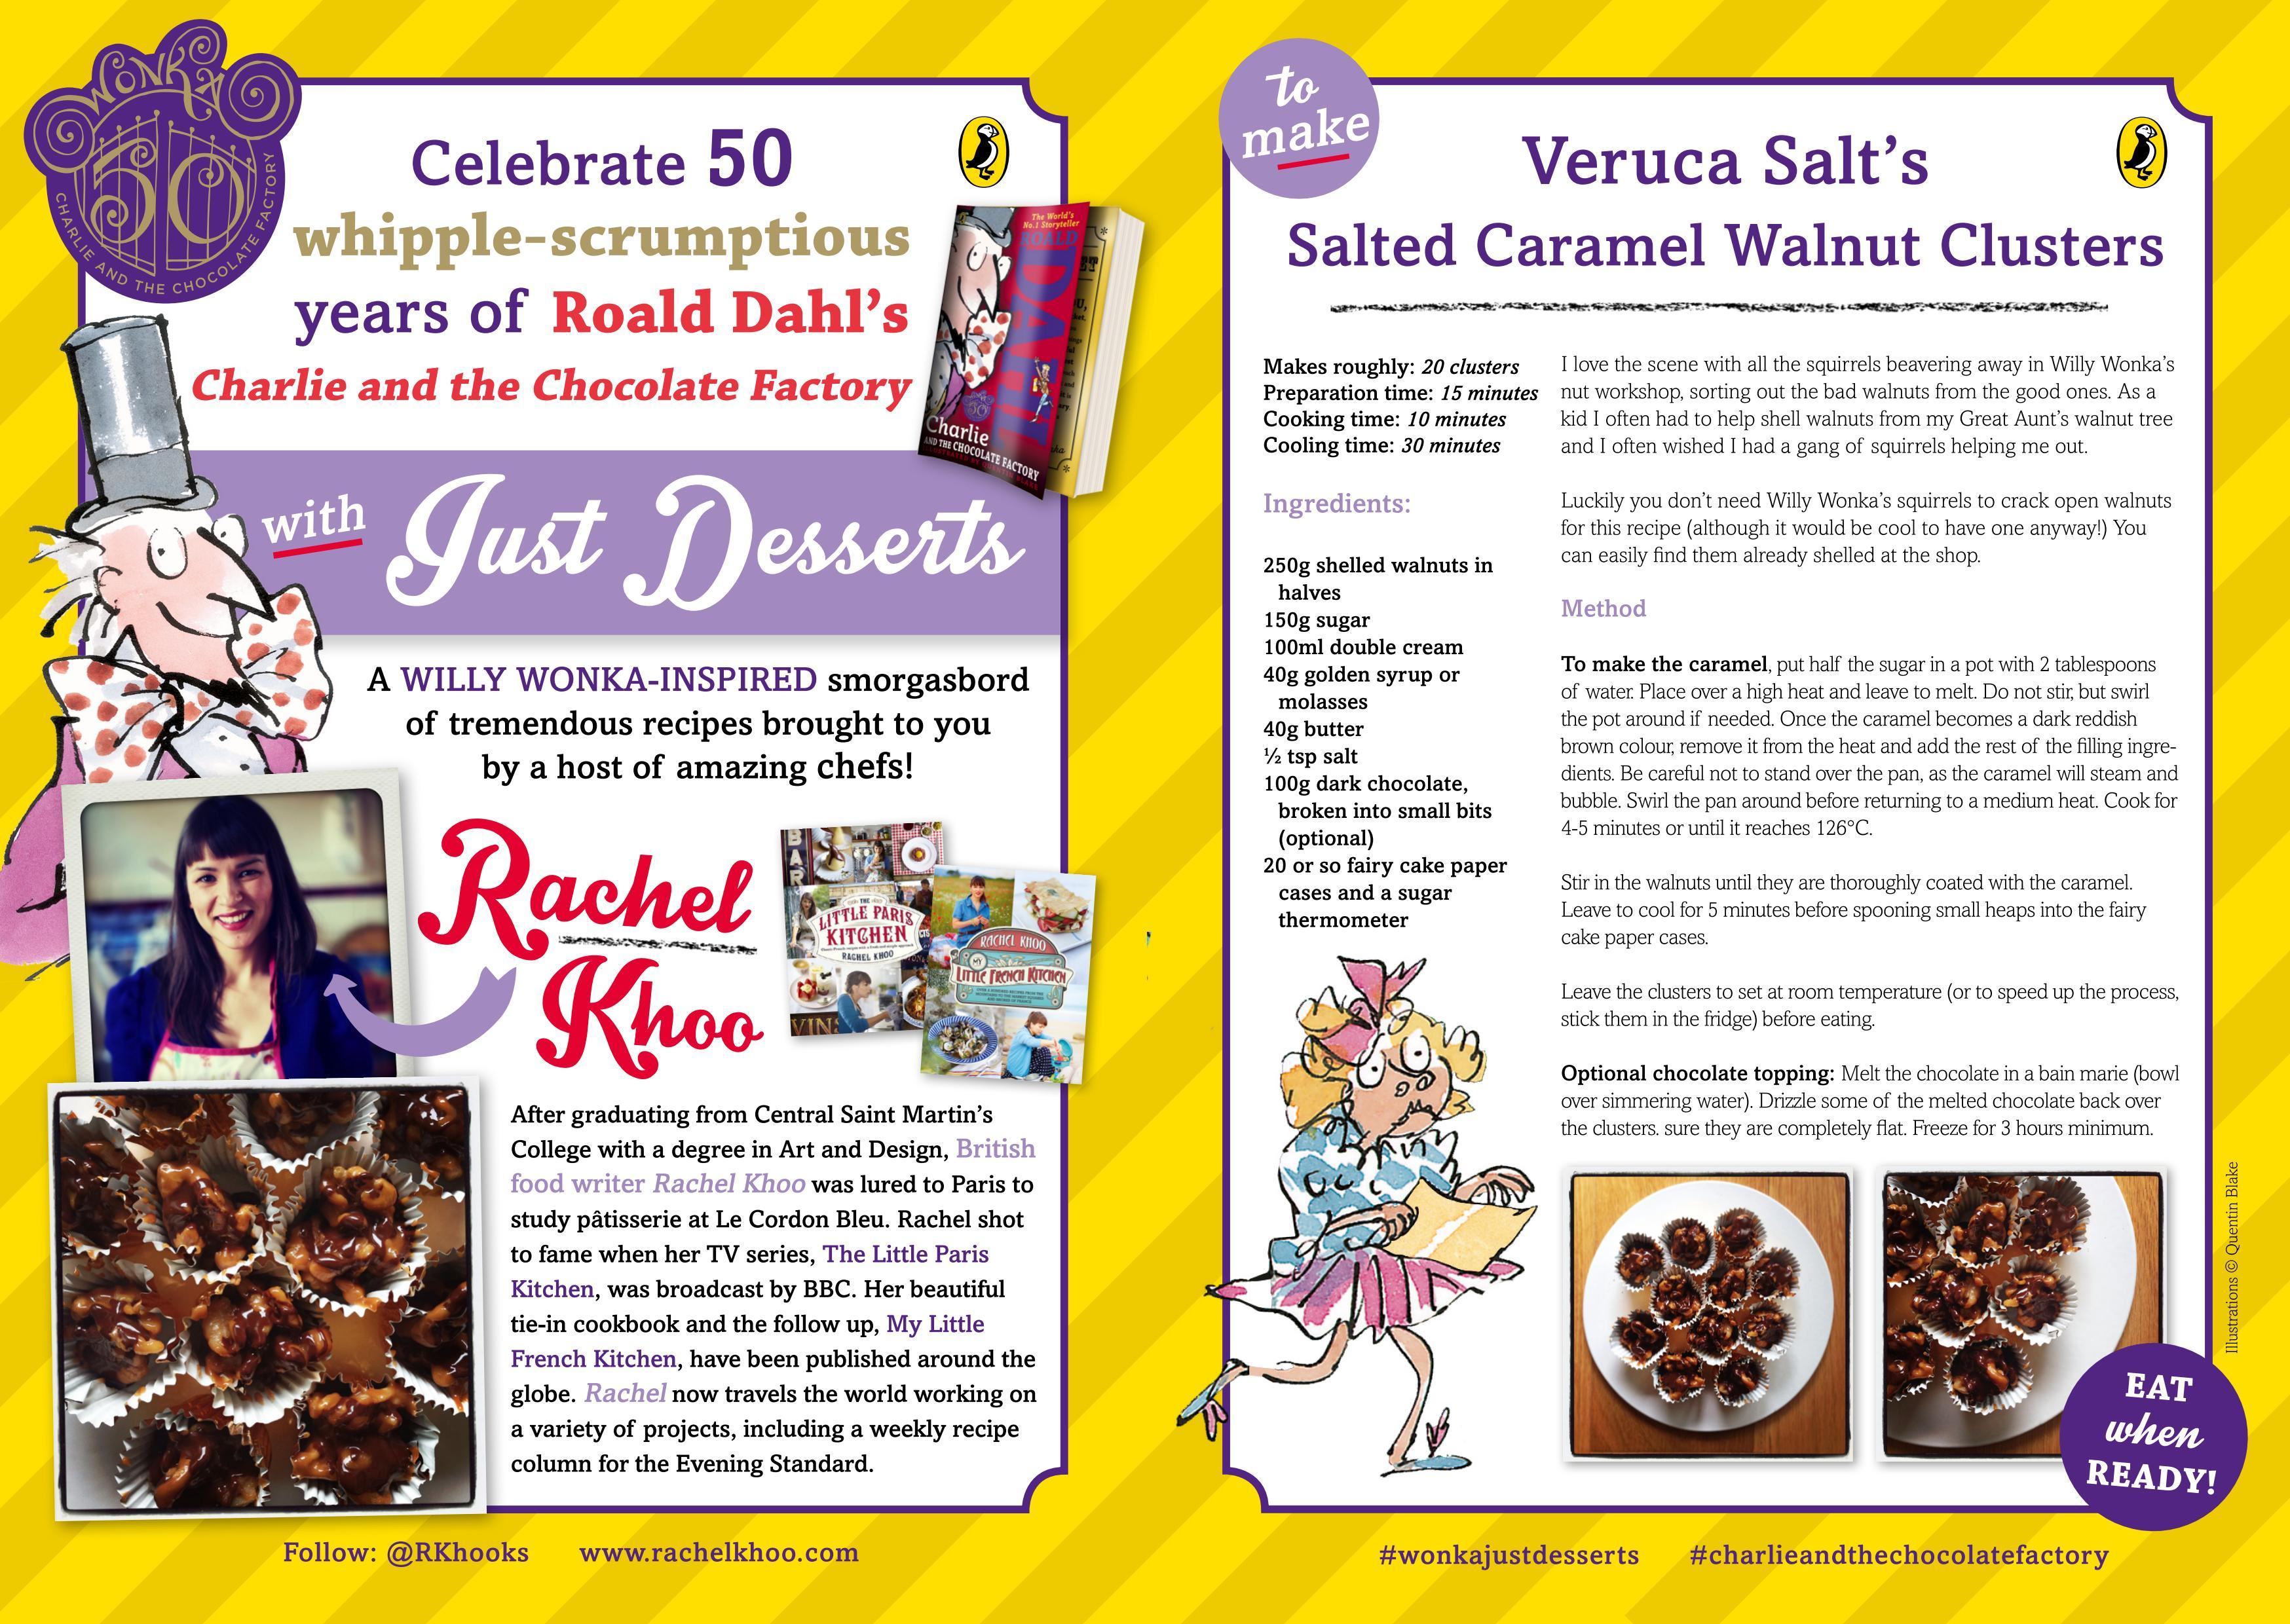 Just Desserts social media campaign